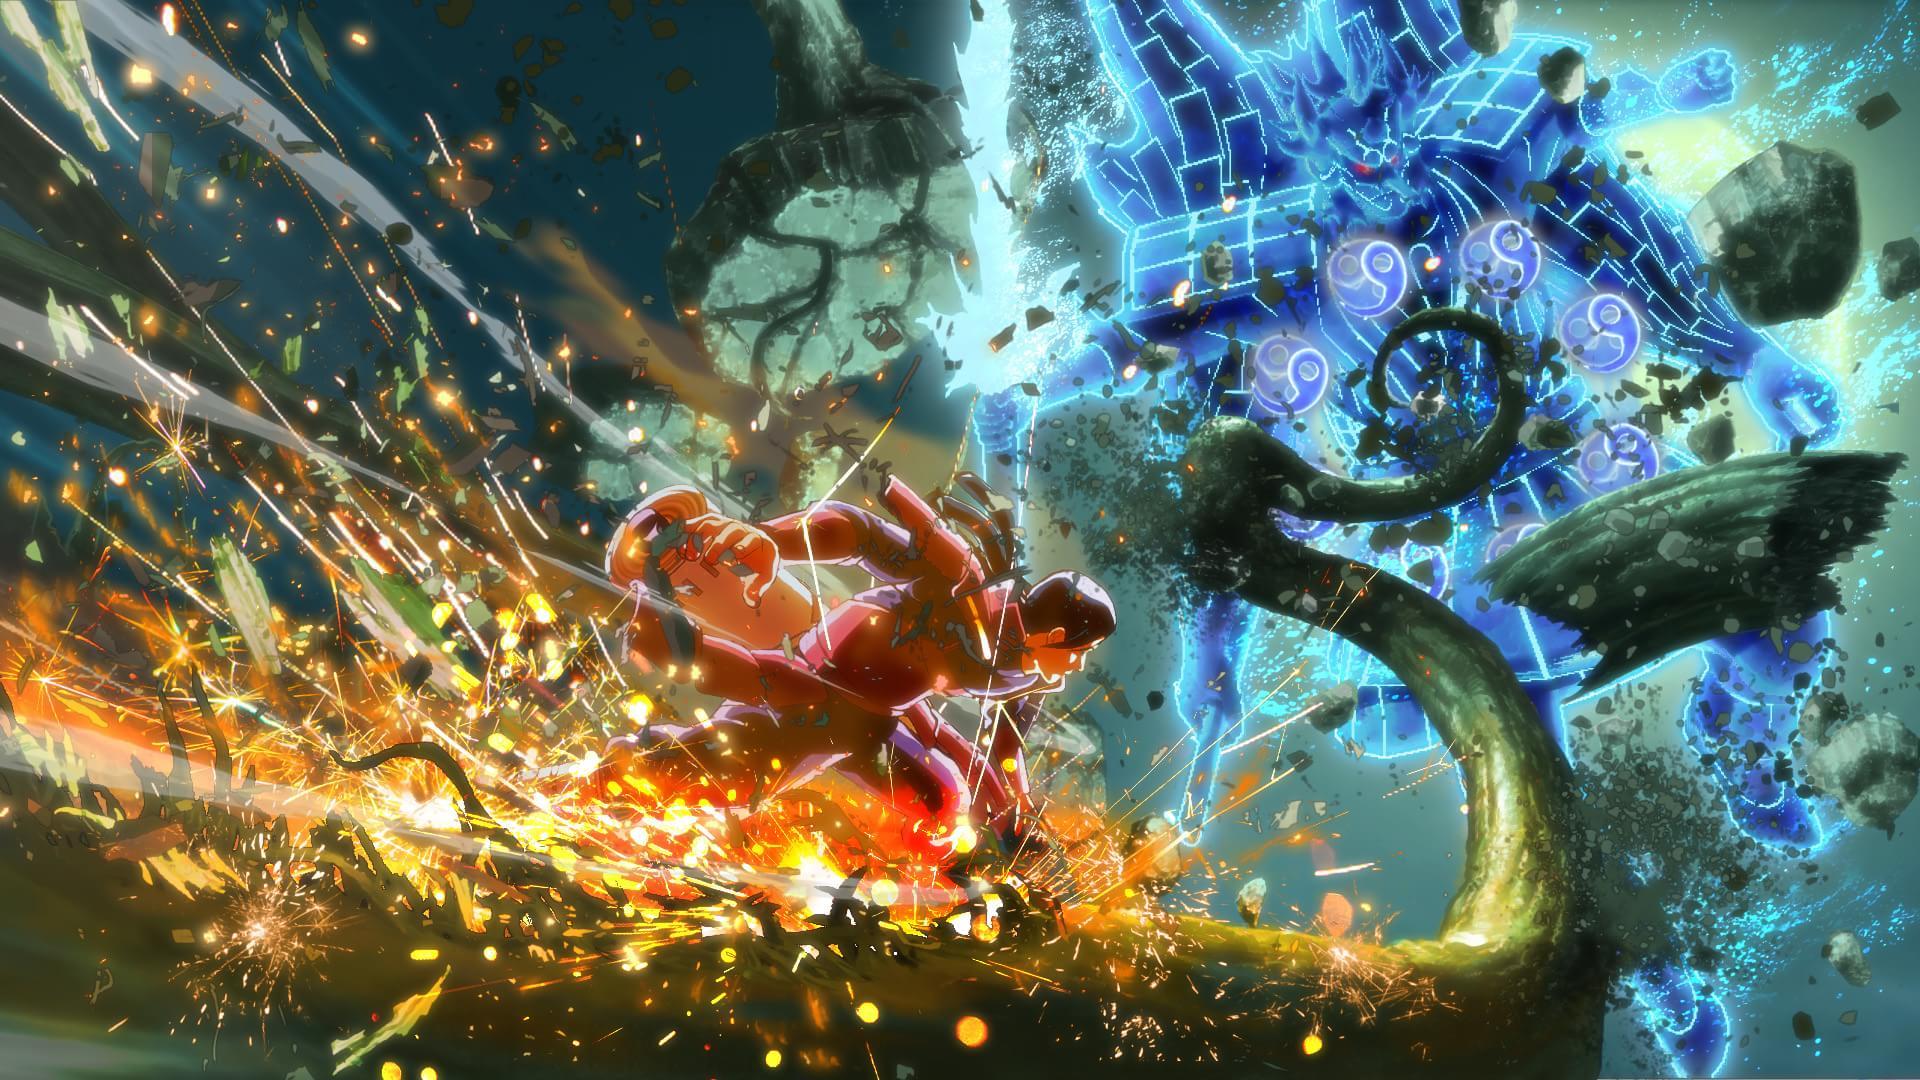 Confira o trailer de lançamento de Naruto Shippuden: Ultimate Ninja Storm 4